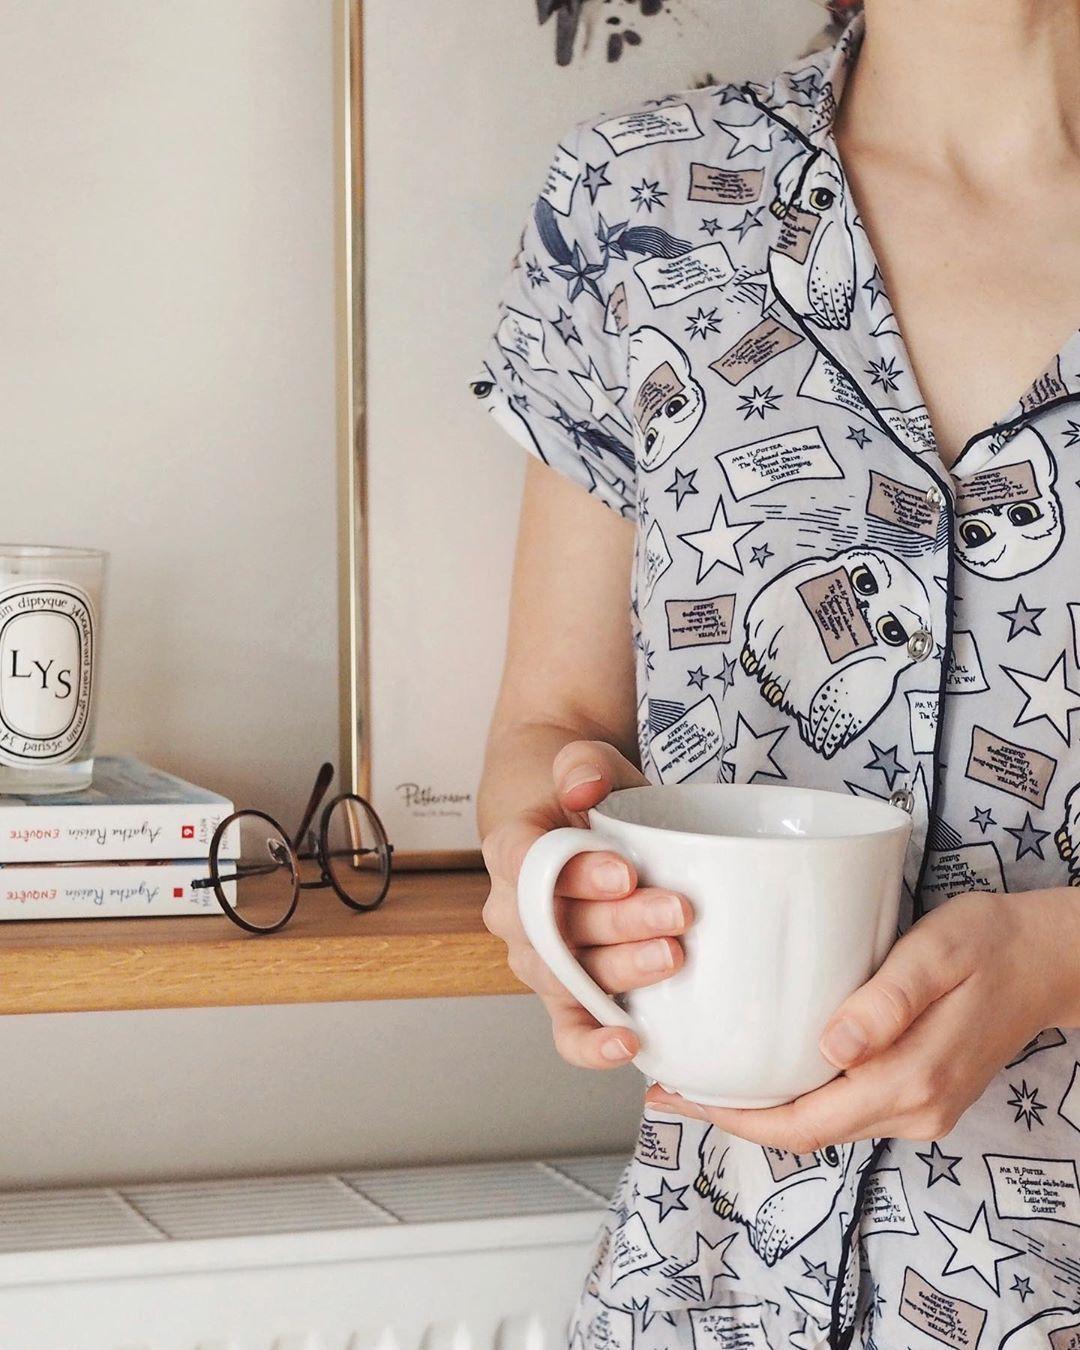 Pyjama par-tea! ☕️☁️| • Fondue savoyarde  Pyjama par-tea! ☕️☁️| • Fondue savoyarde #fonduesavoyarde